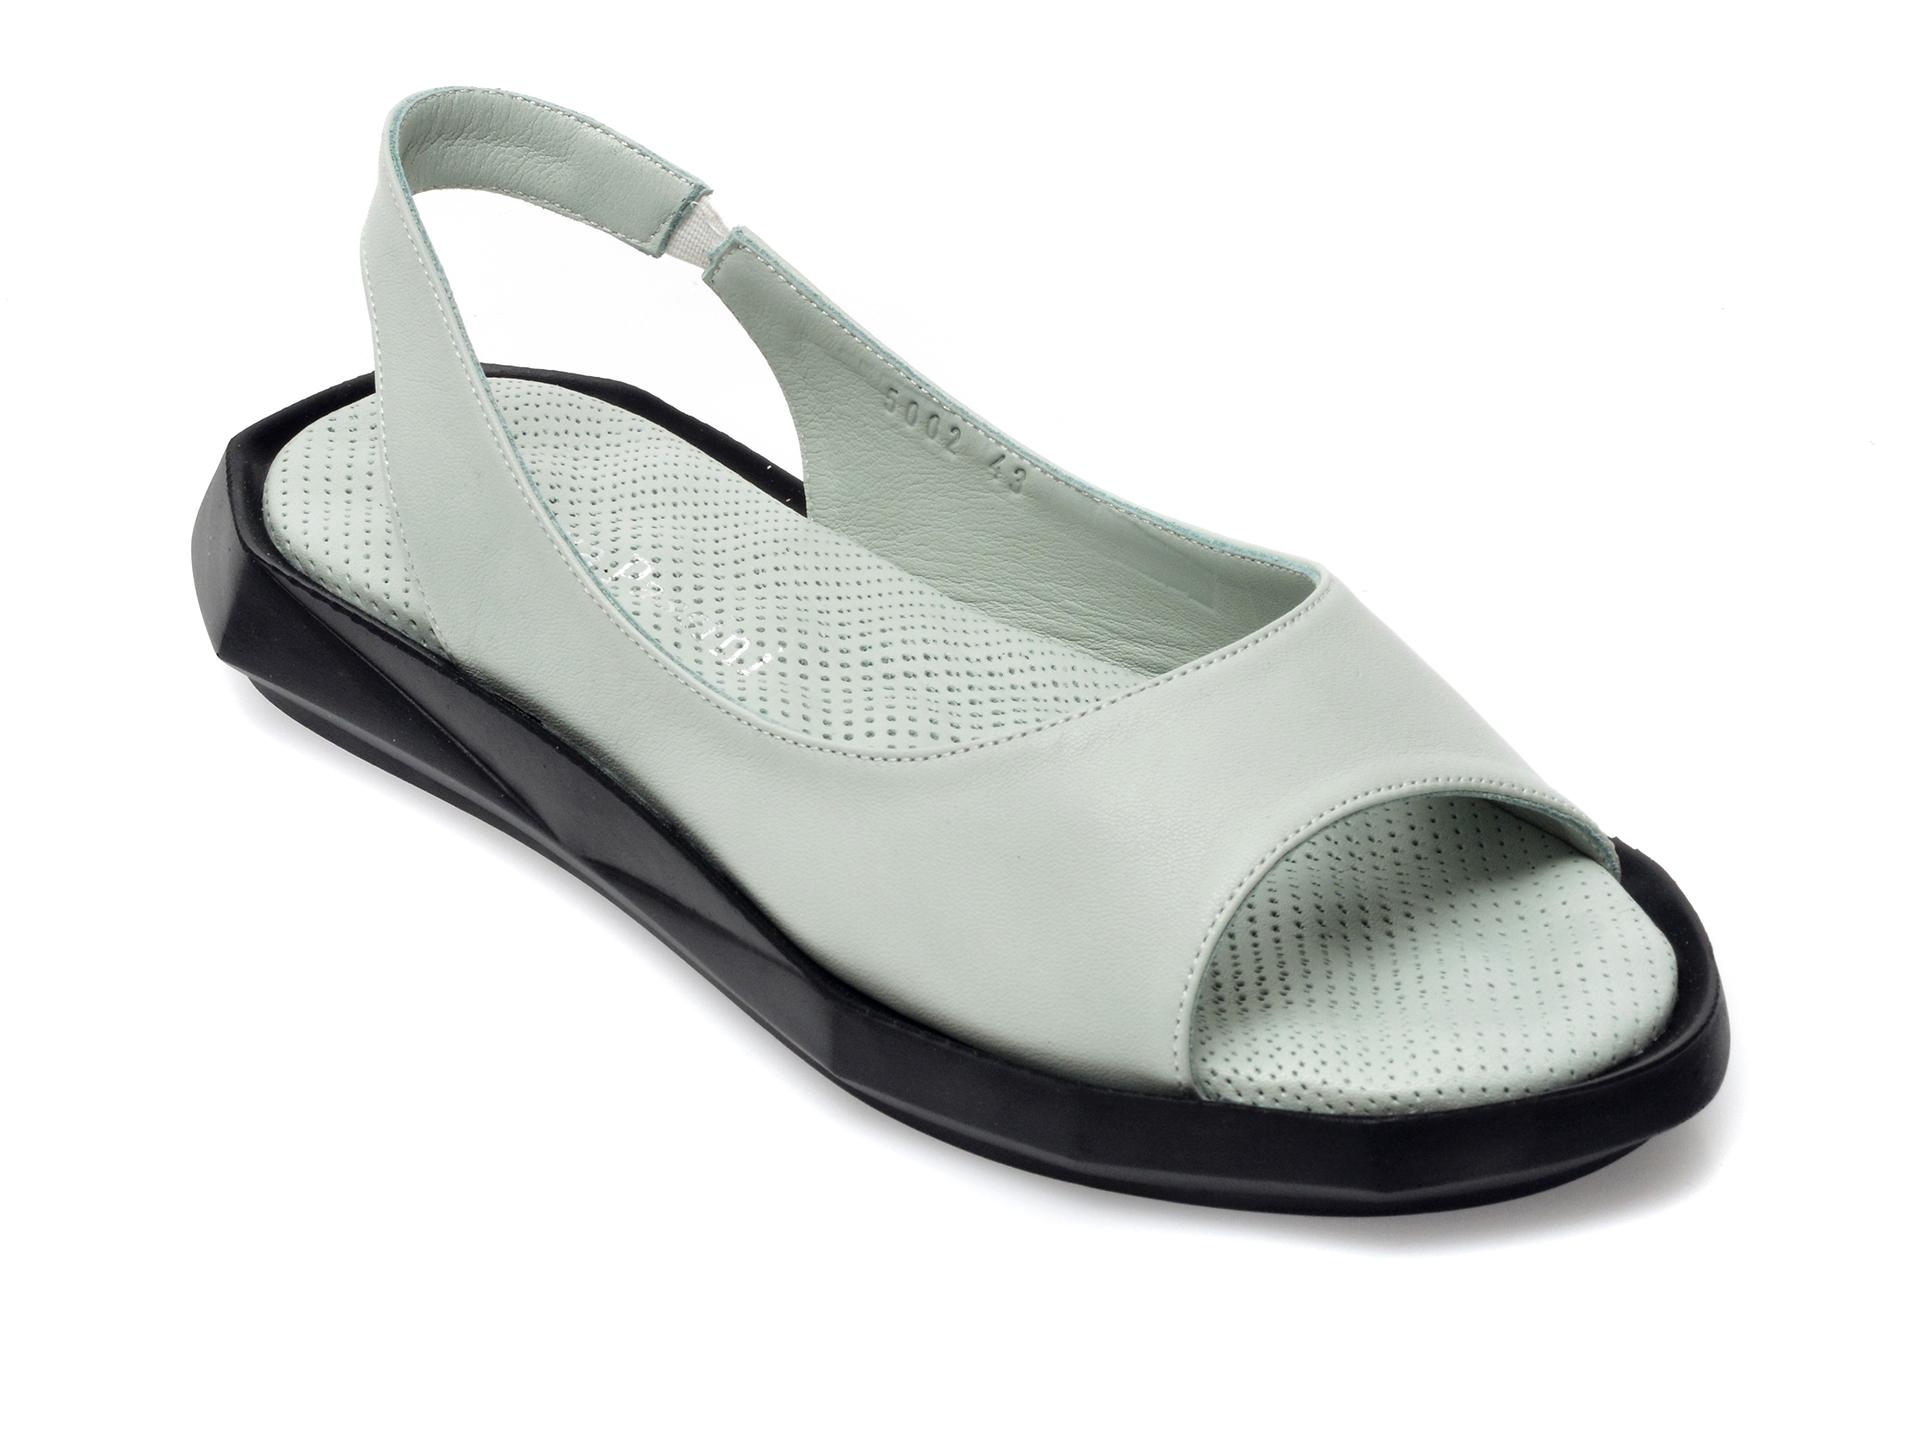 Sandale FLAVIA PASSINI verzi, 705002, din piele naturala imagine otter.ro 2021